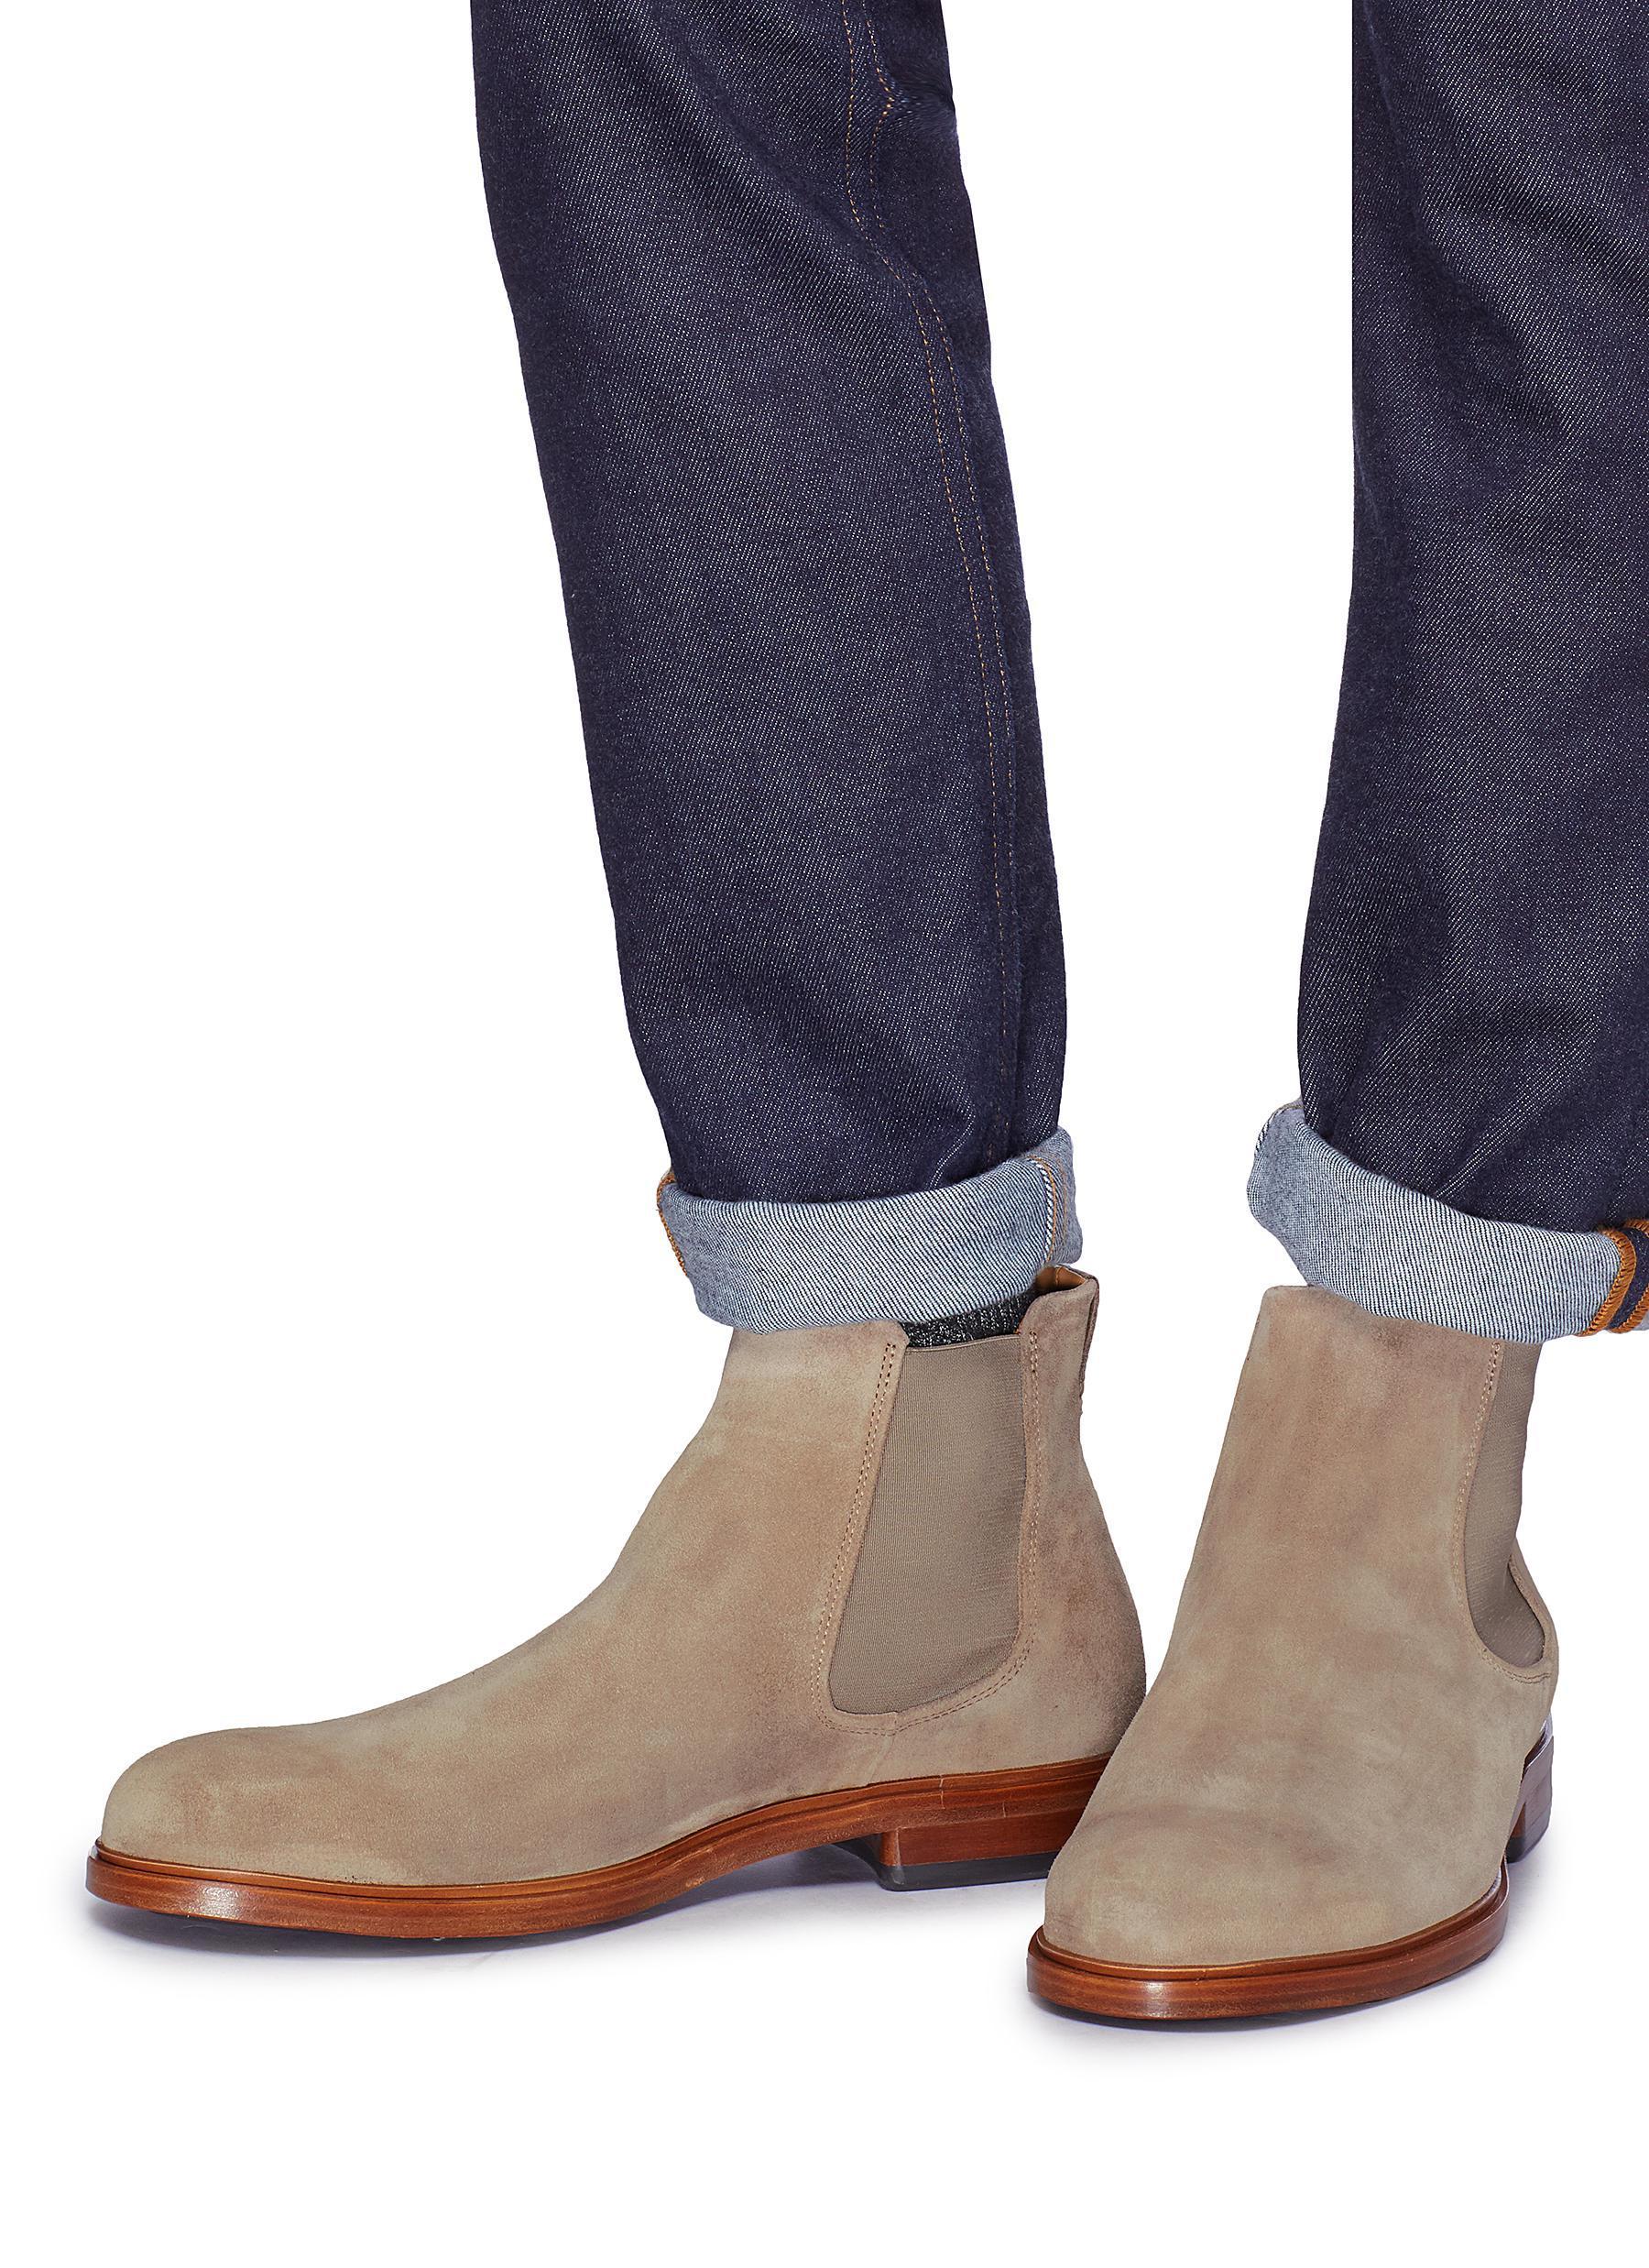 39bddd977 Vince 'burroughs' Suede Chelsea Boots for Men - Lyst